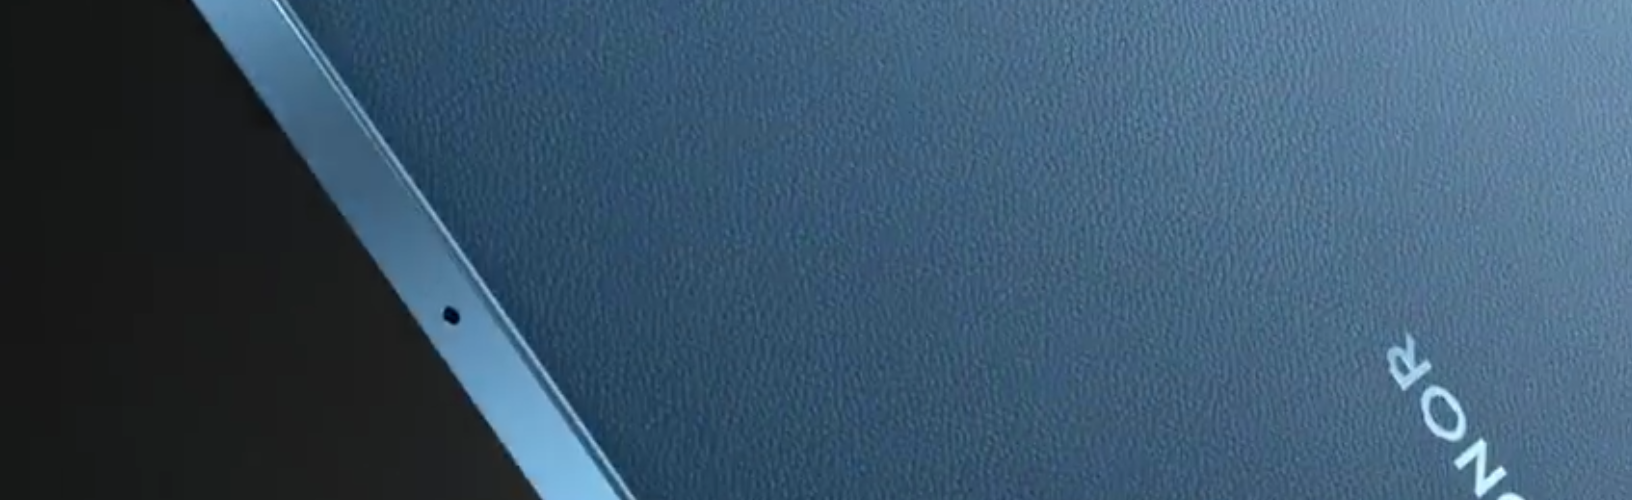 honor v7 pro tablet teaser